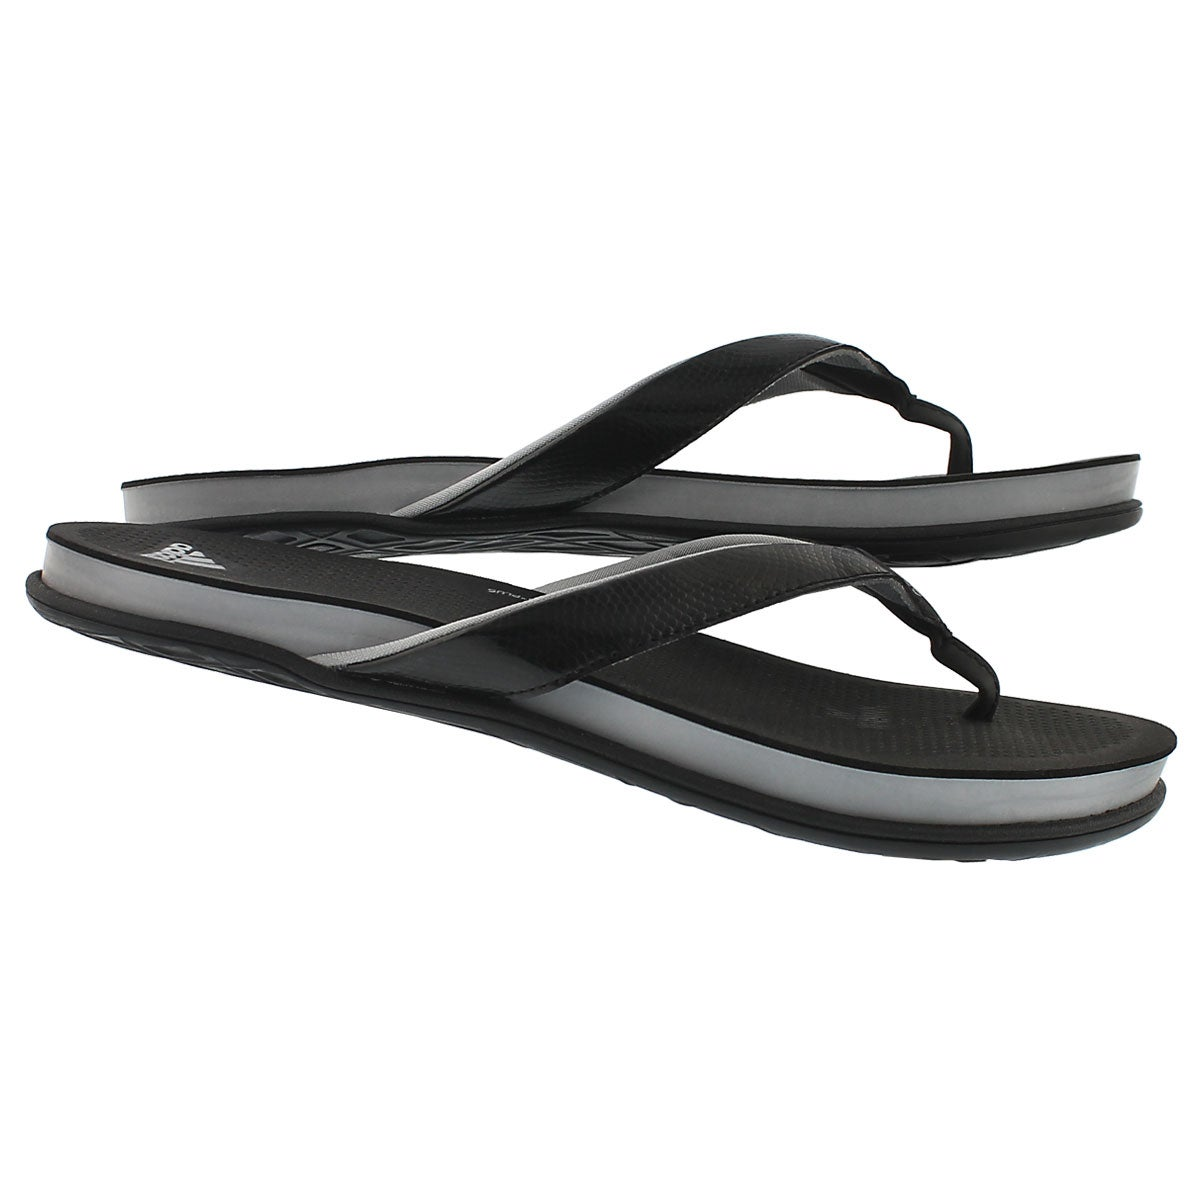 Lds Cloudfoam Ultra Y black thong sandal